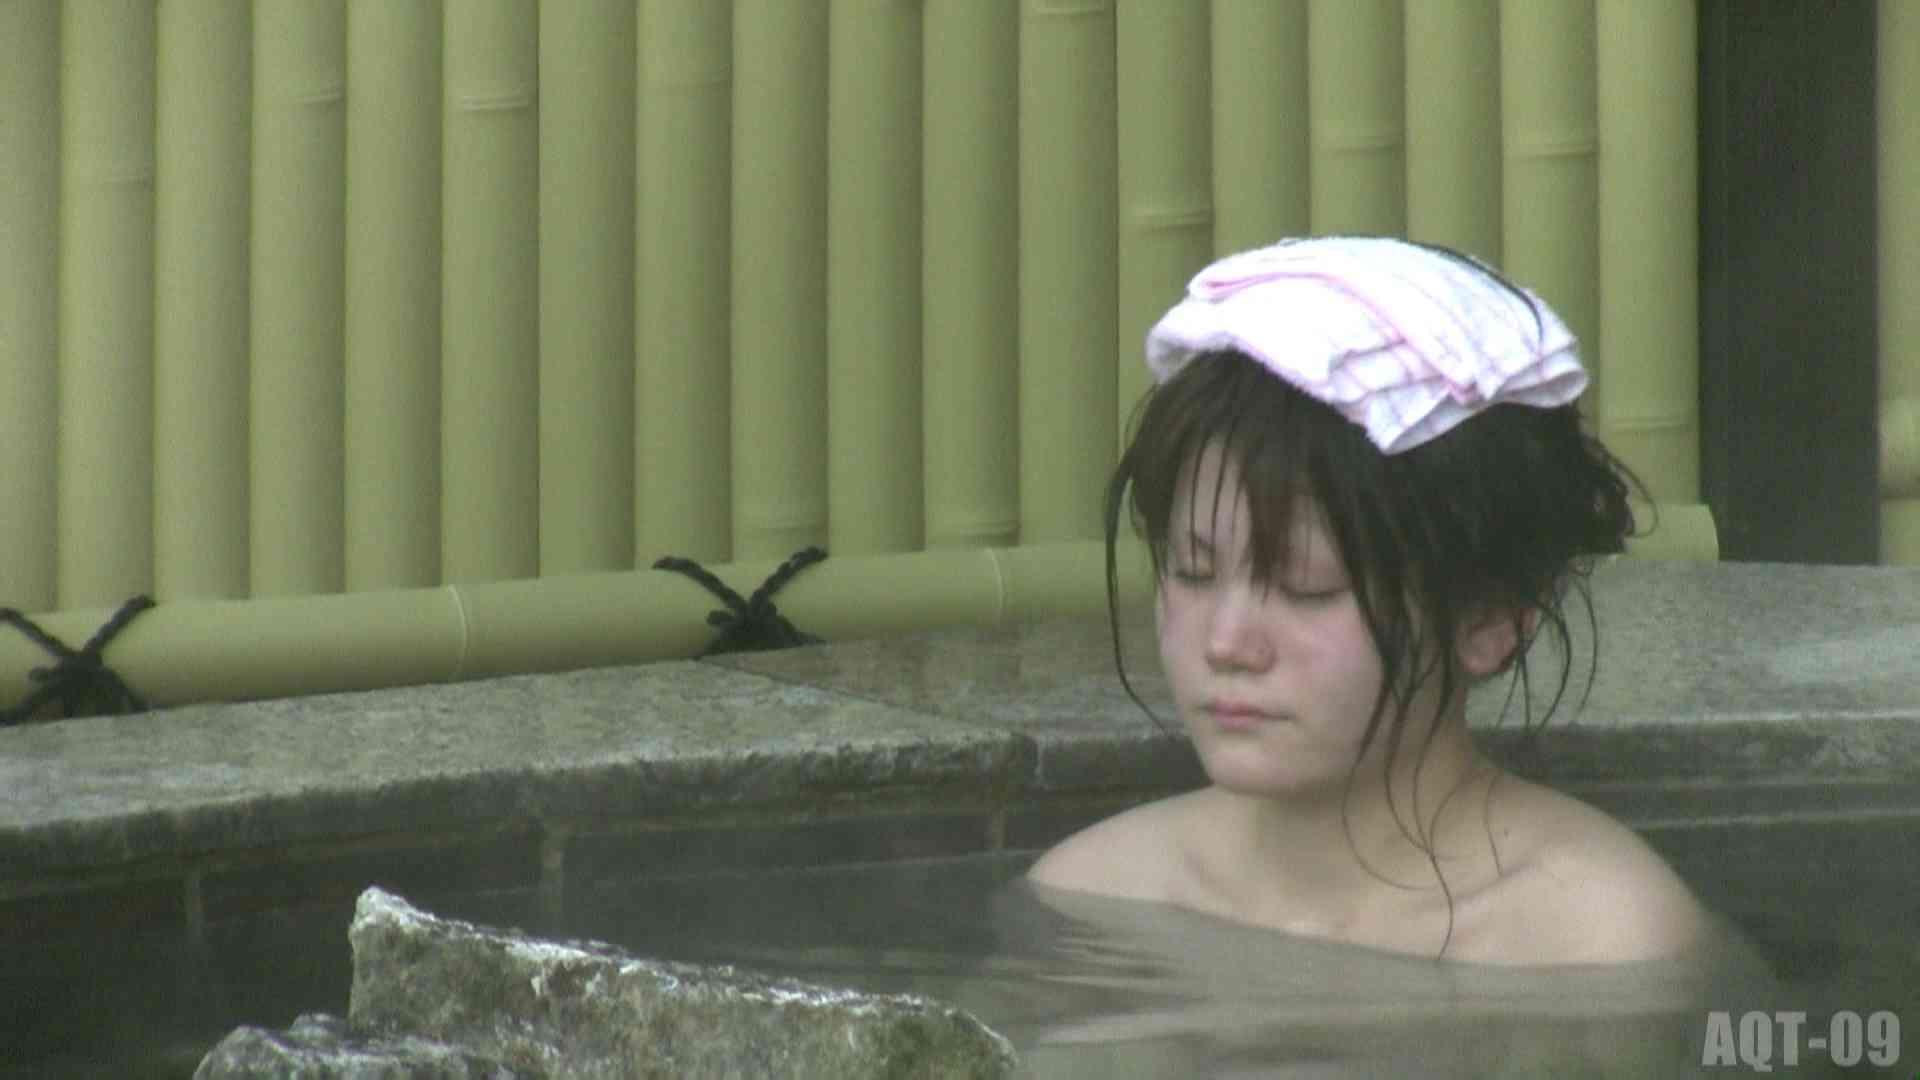 Aquaな露天風呂Vol.789 盗撮映像  51Pix 9